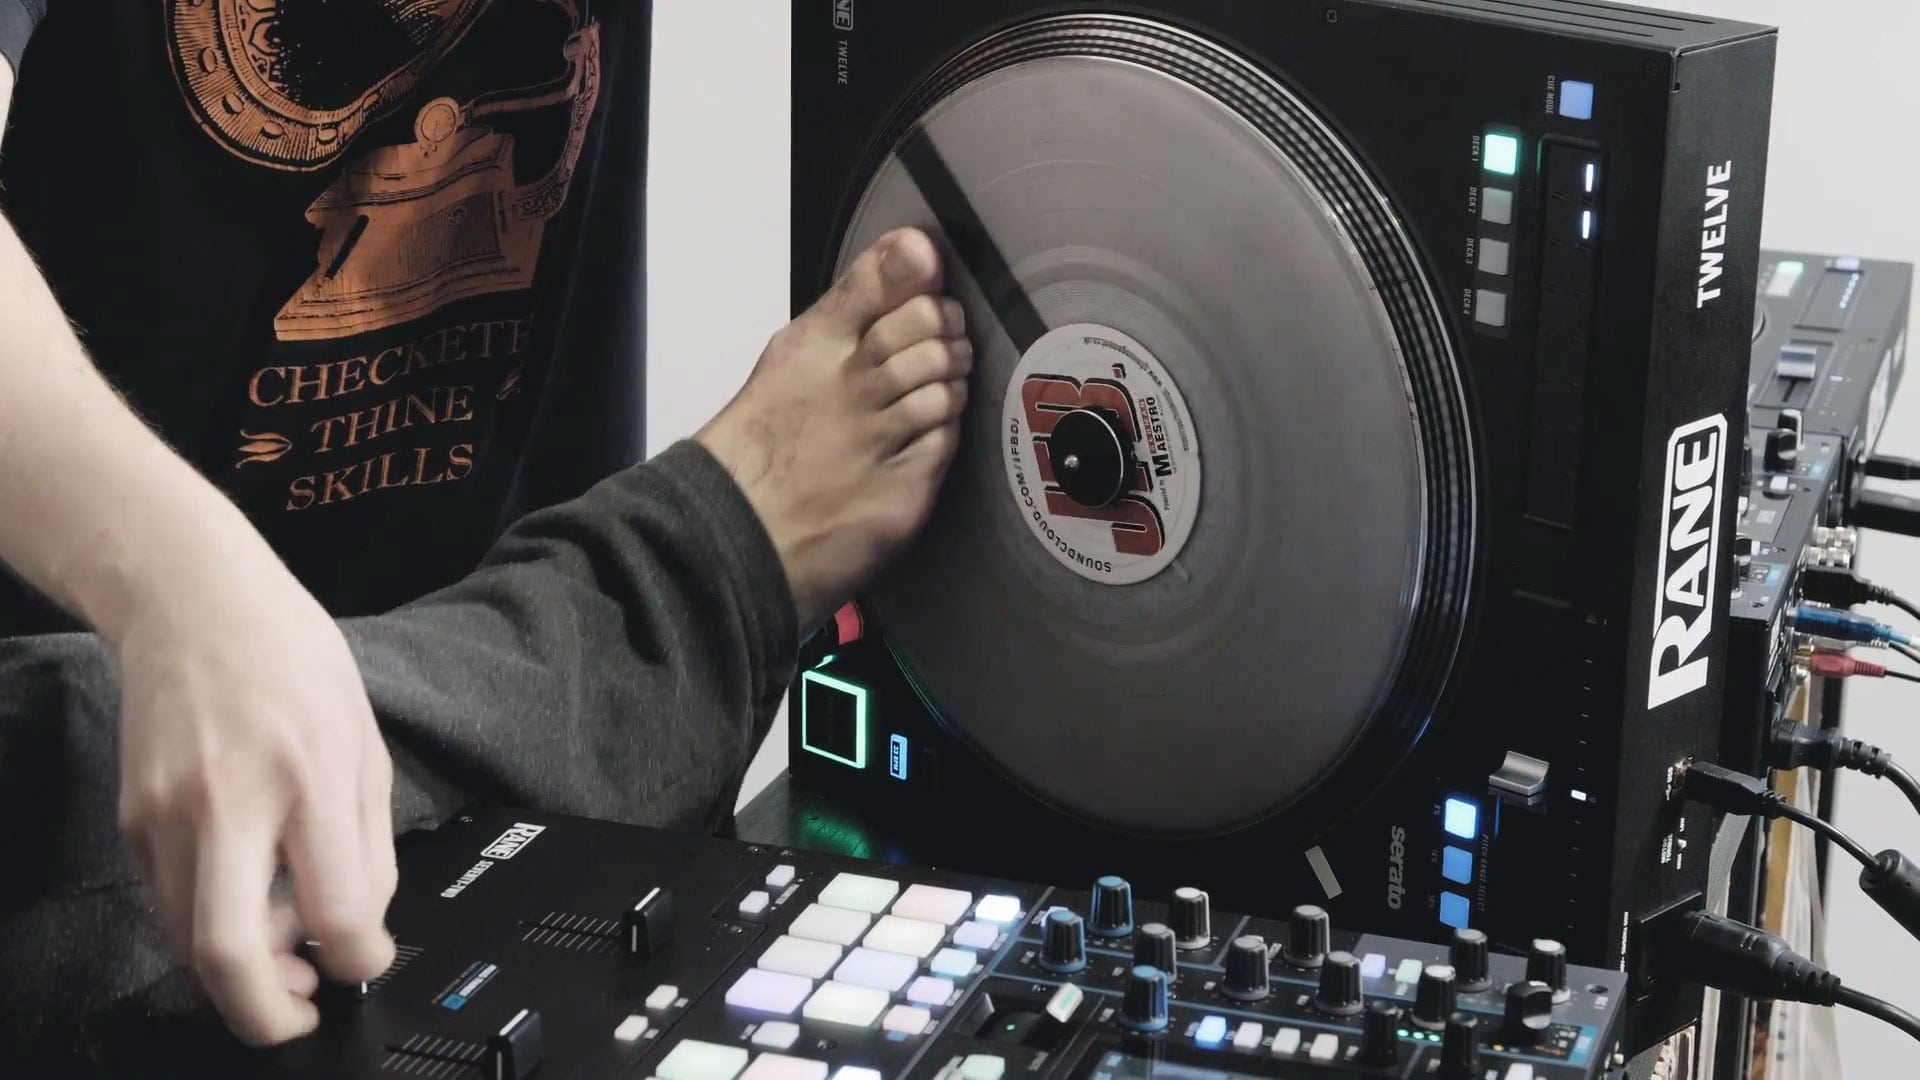 SHOCKING VIDEO: JFB and Mr Switch abuse Rane gear 3